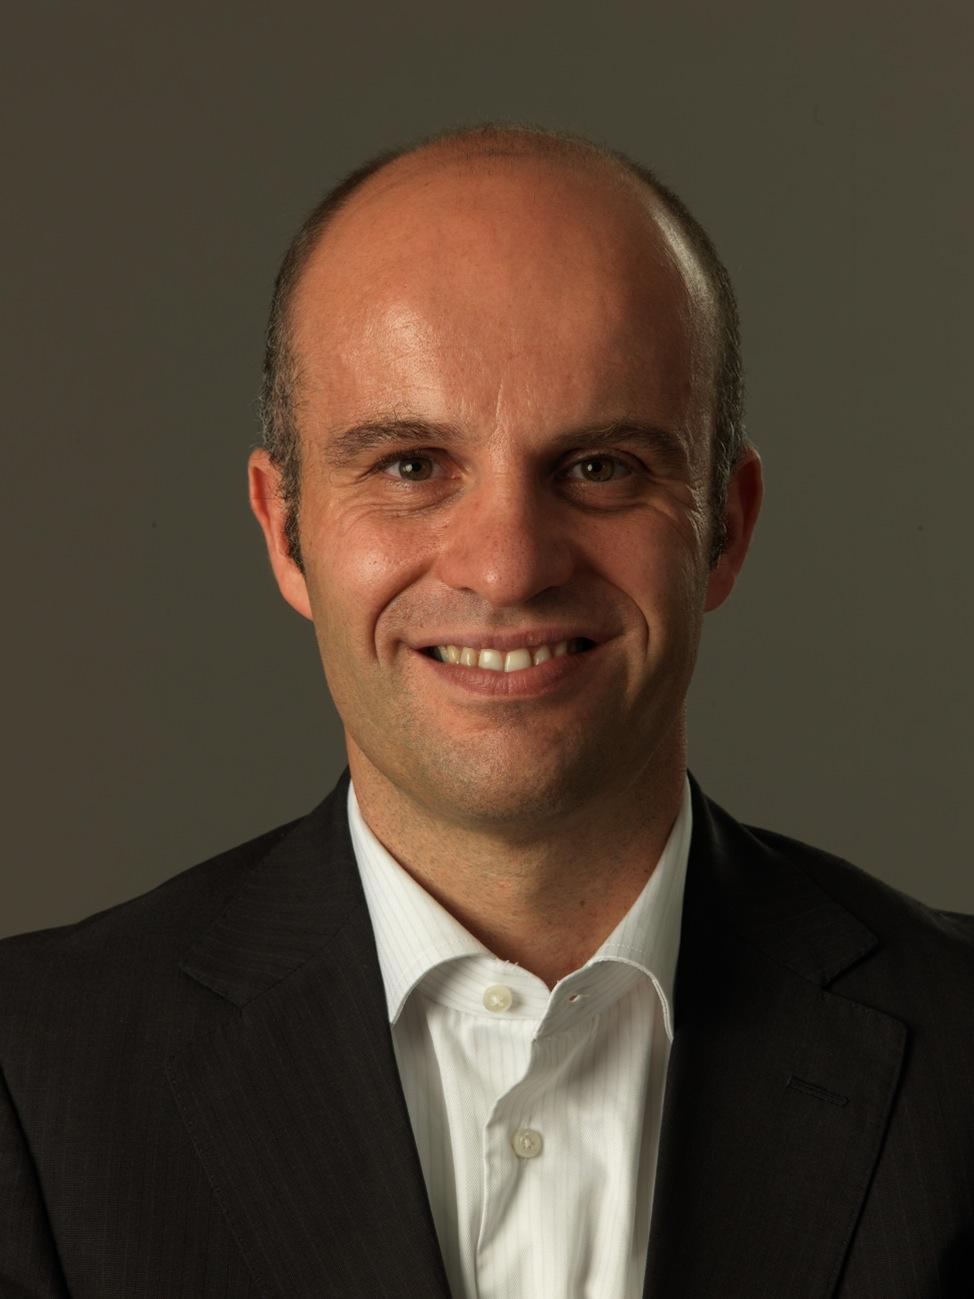 Georg Kostner